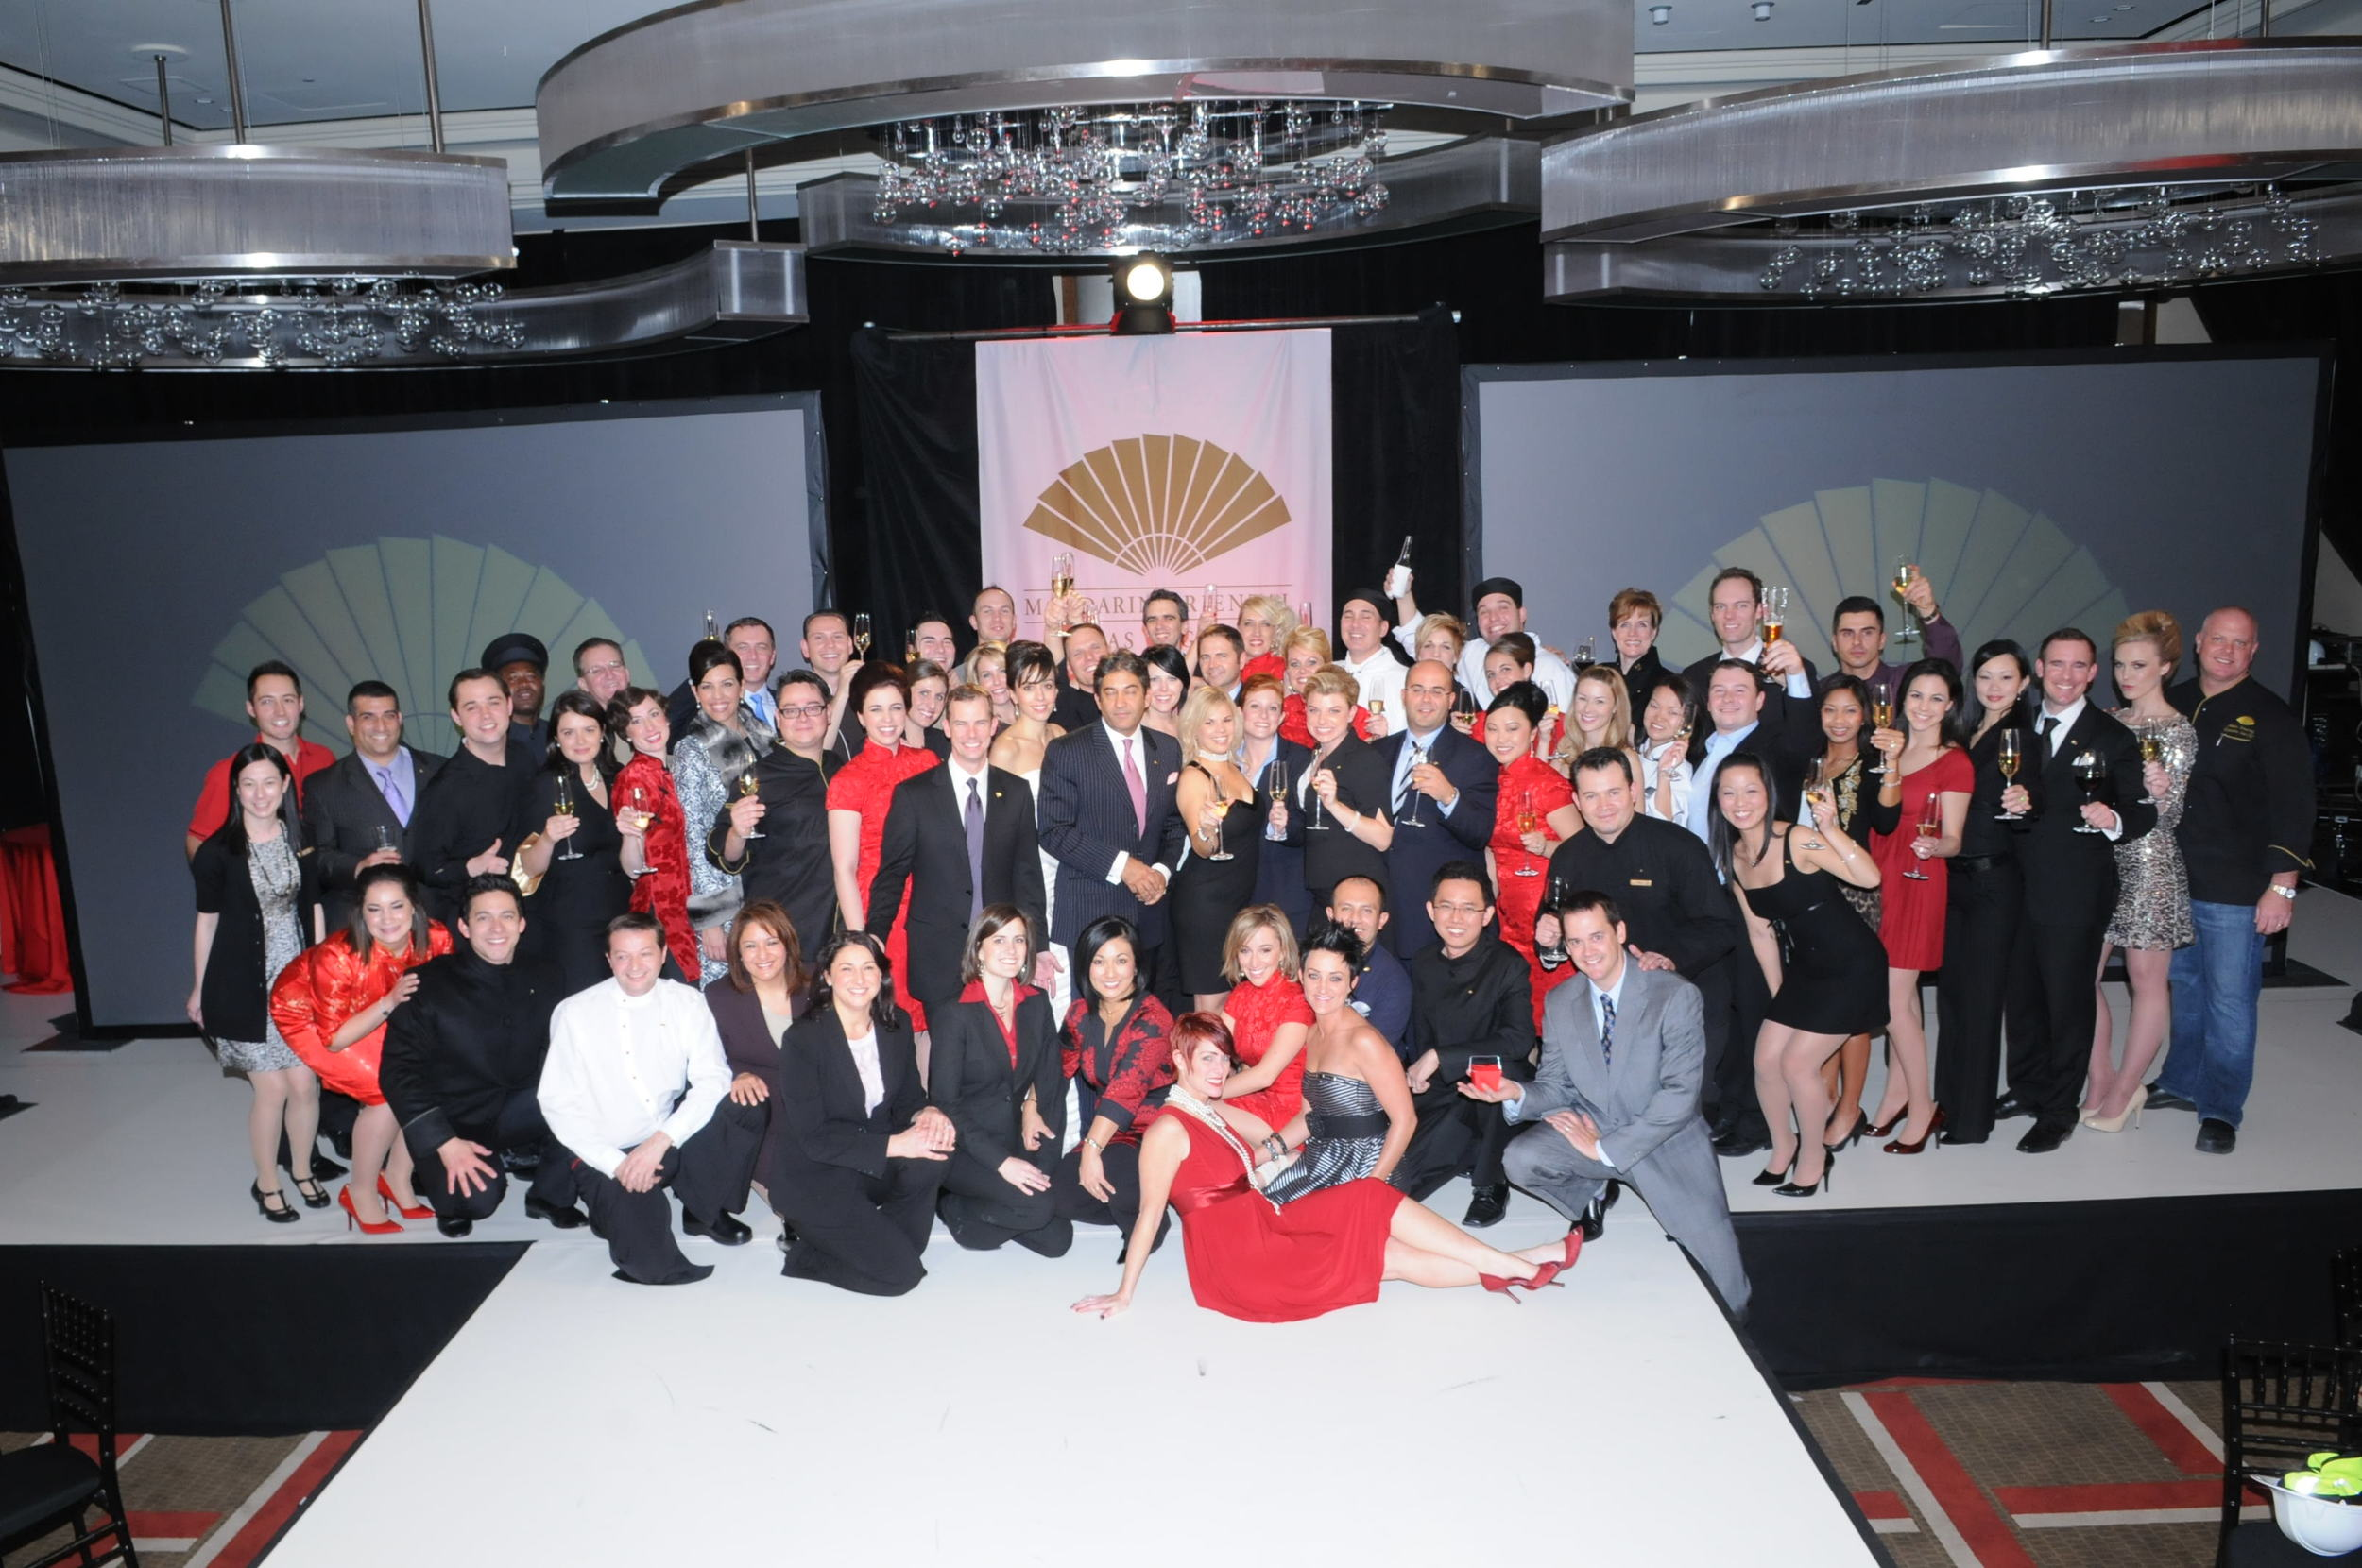 The Mandarin Oriental Team Members, General Manager and Asst. General Manager, Winning Edge Team, including Tanja Nikolic.